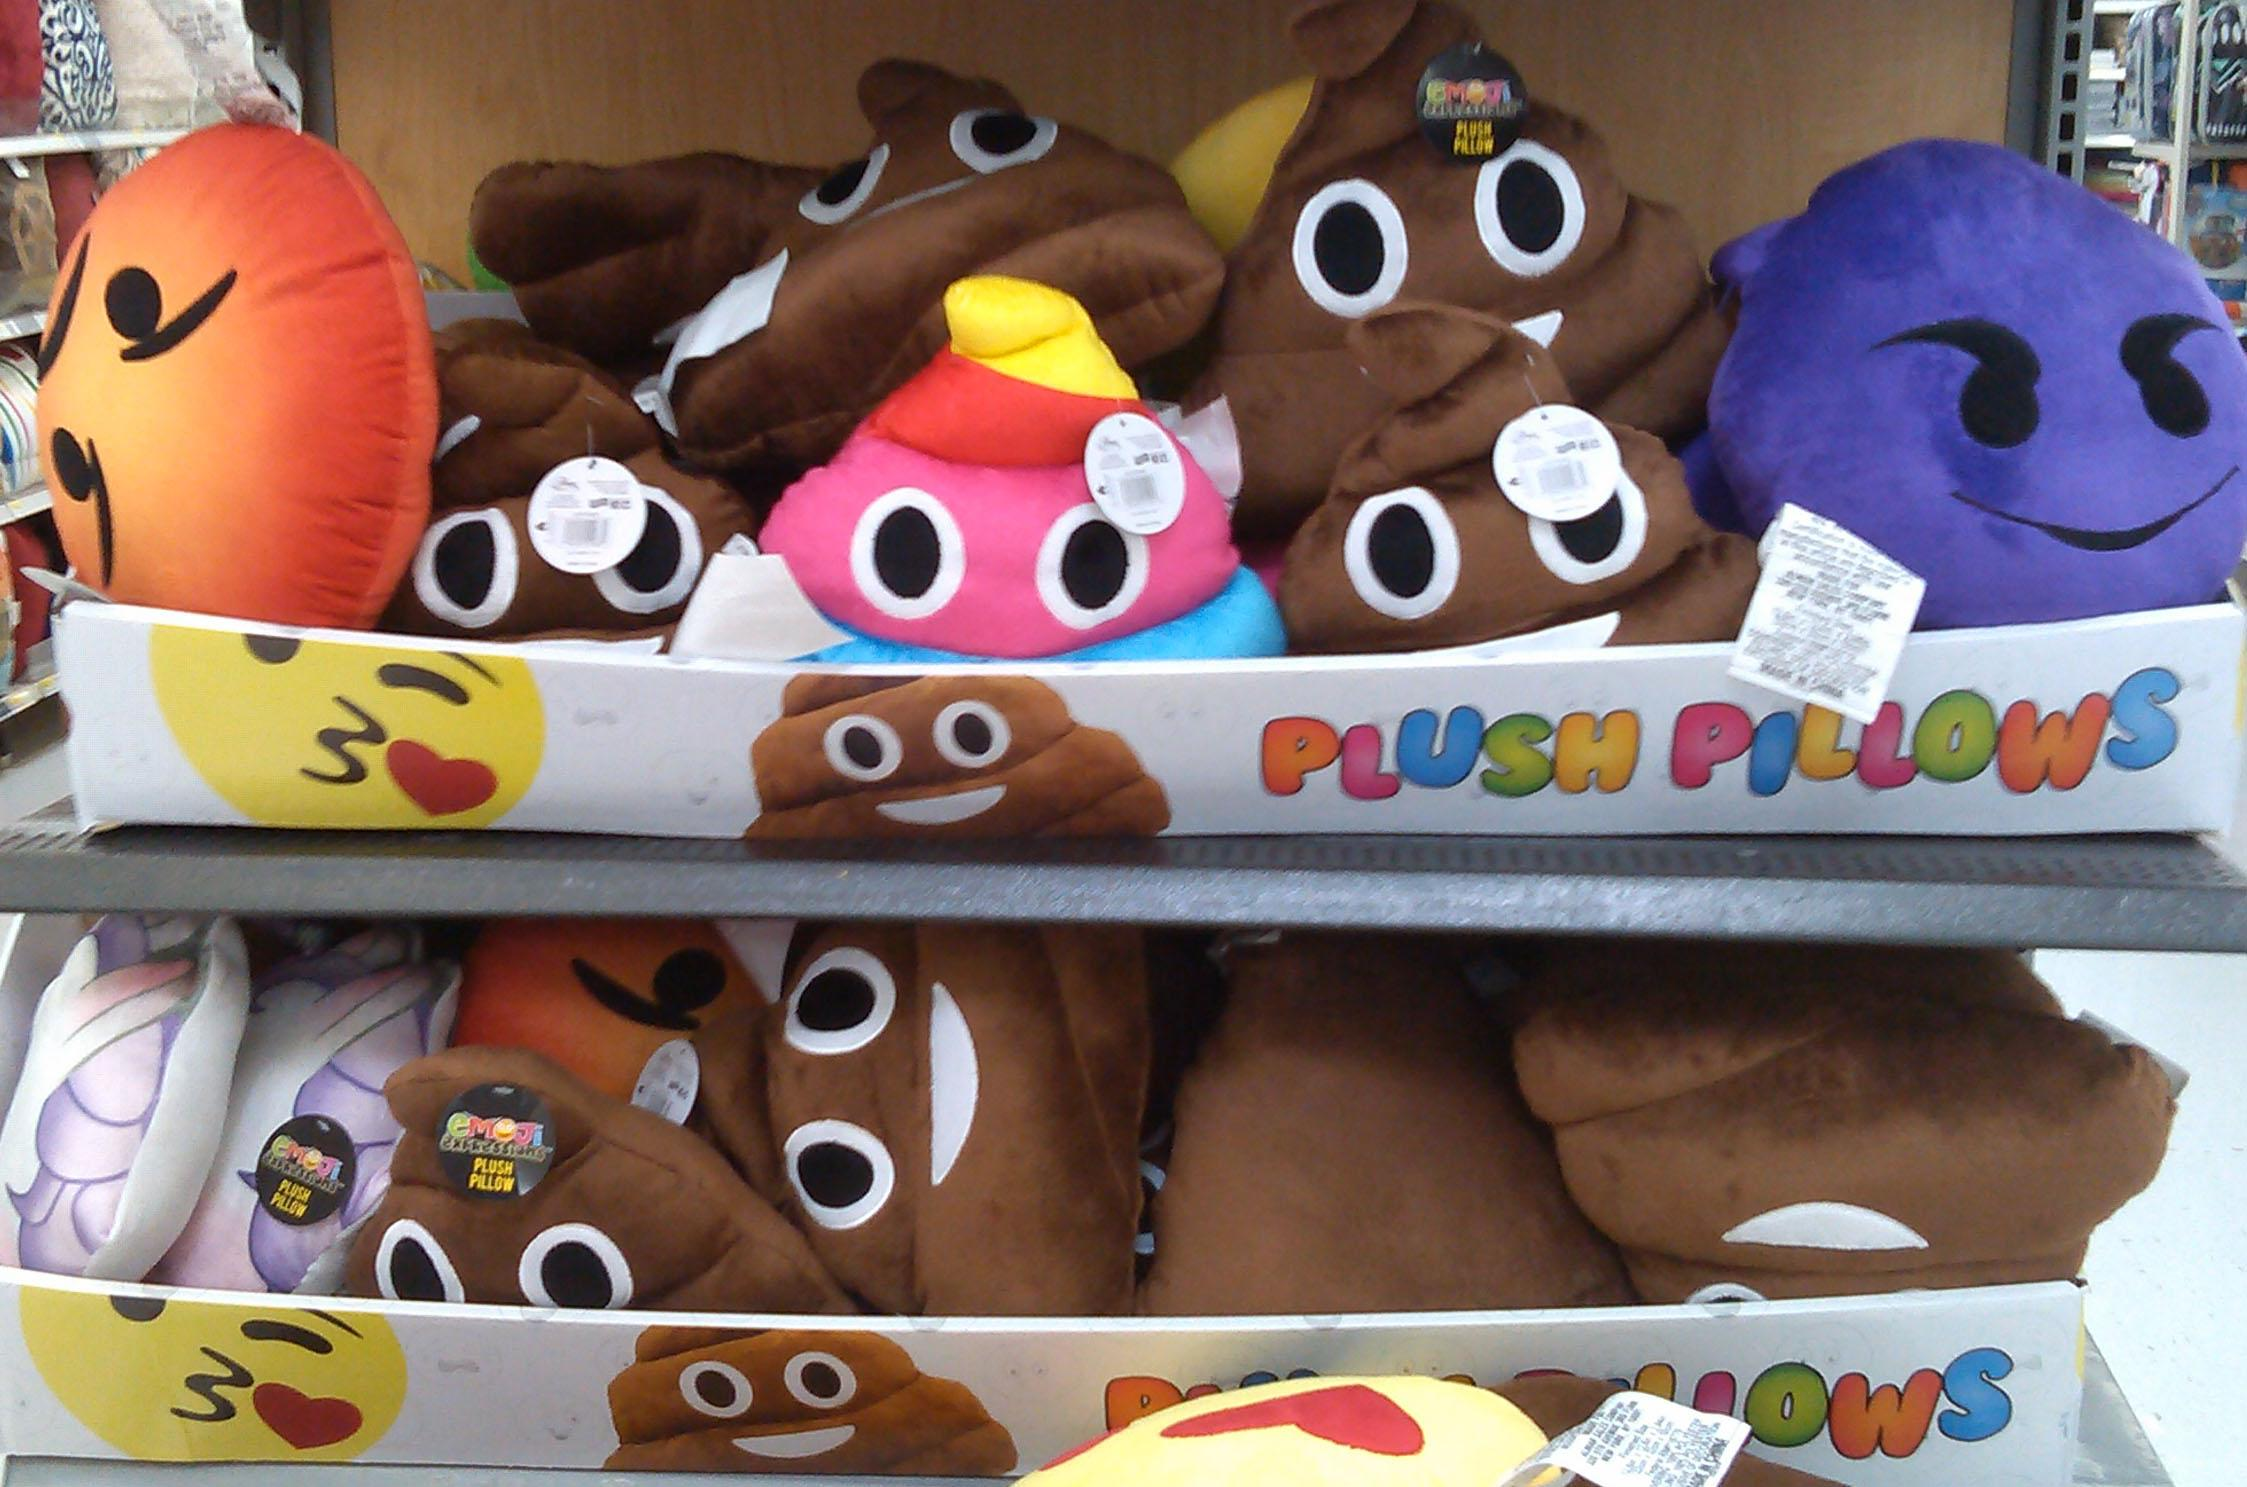 More emojis (Photo By: Laura Nicolescu)